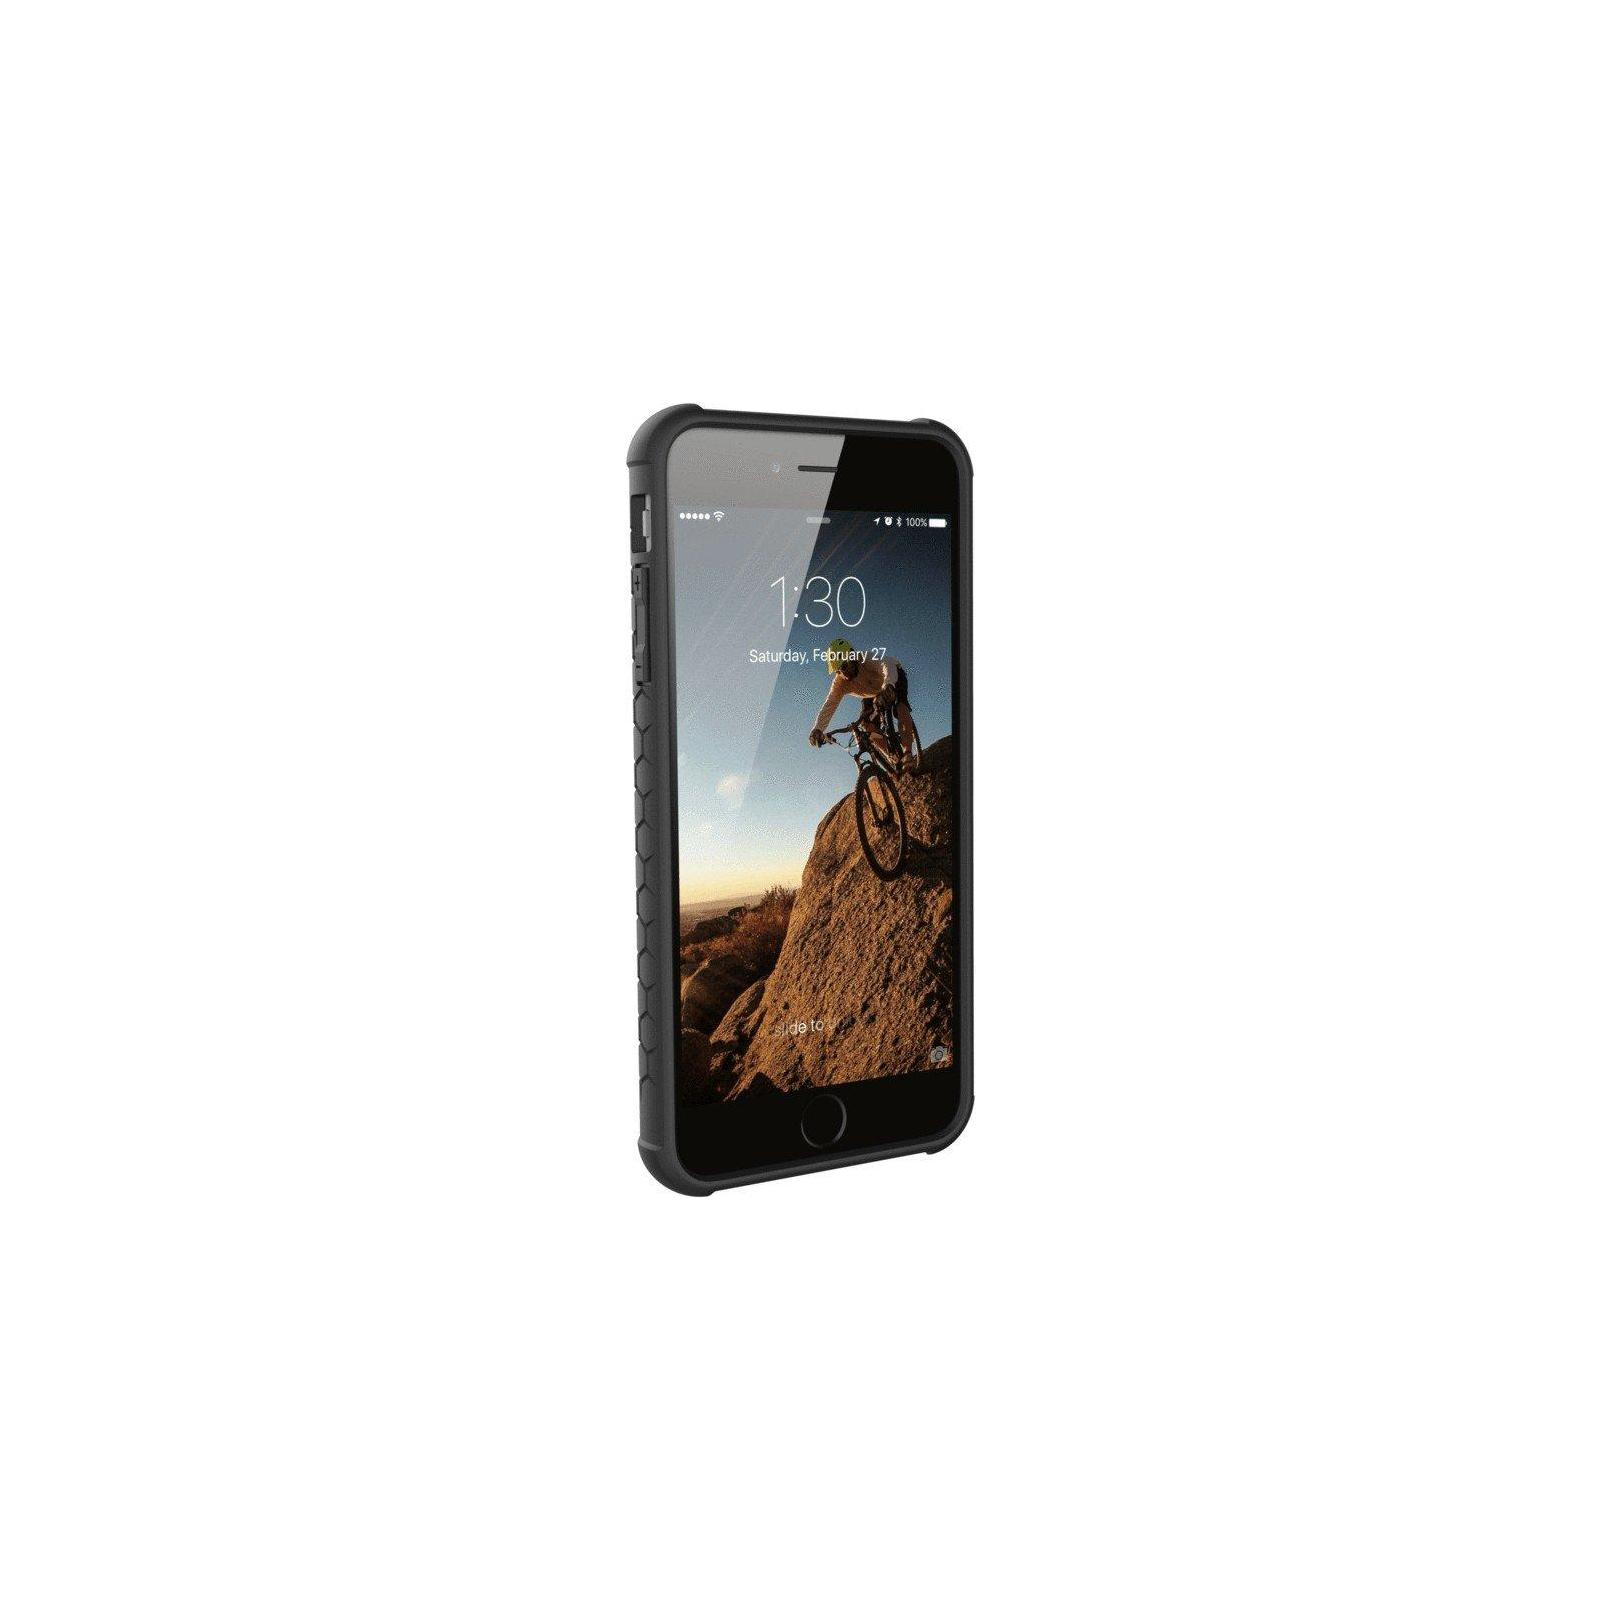 Чехол для моб. телефона UAG iPhone 8/7/6S/6 Plus Monarch Graphite (IPH8/7PLS-M-GR) изображение 5